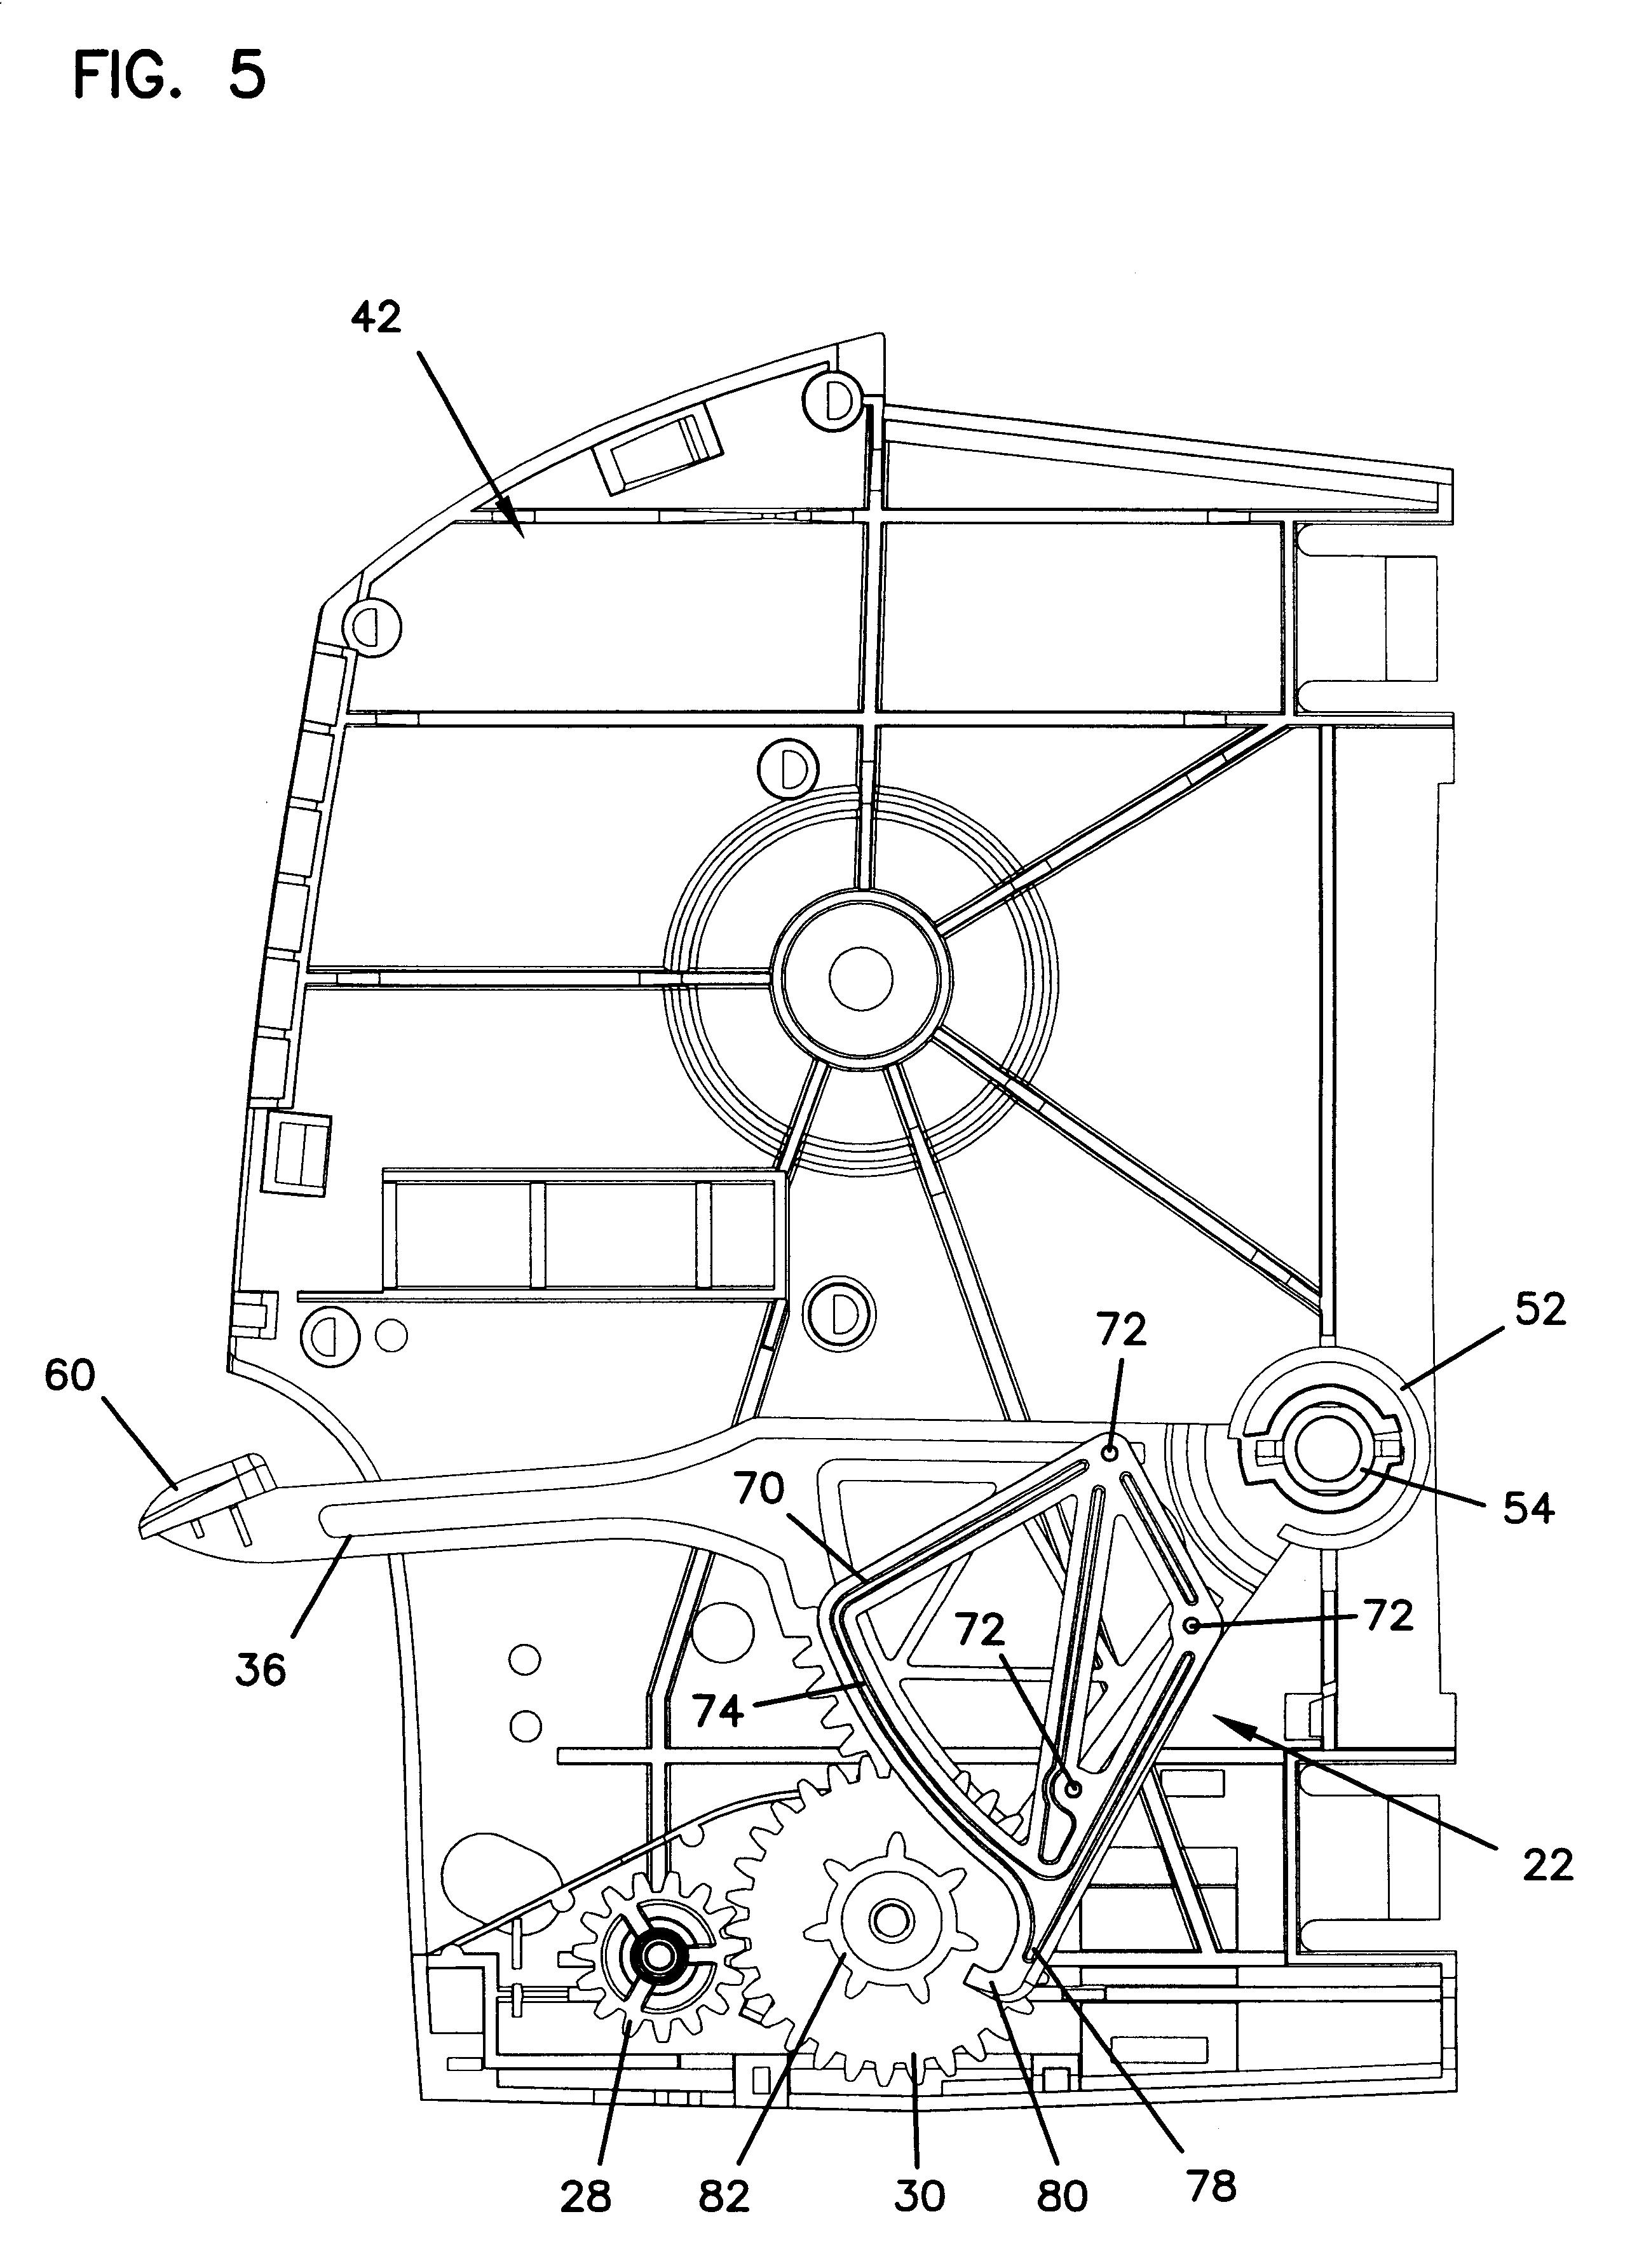 Mechanism Wheel Lever : Patent us towel dispenser with anti free wheel